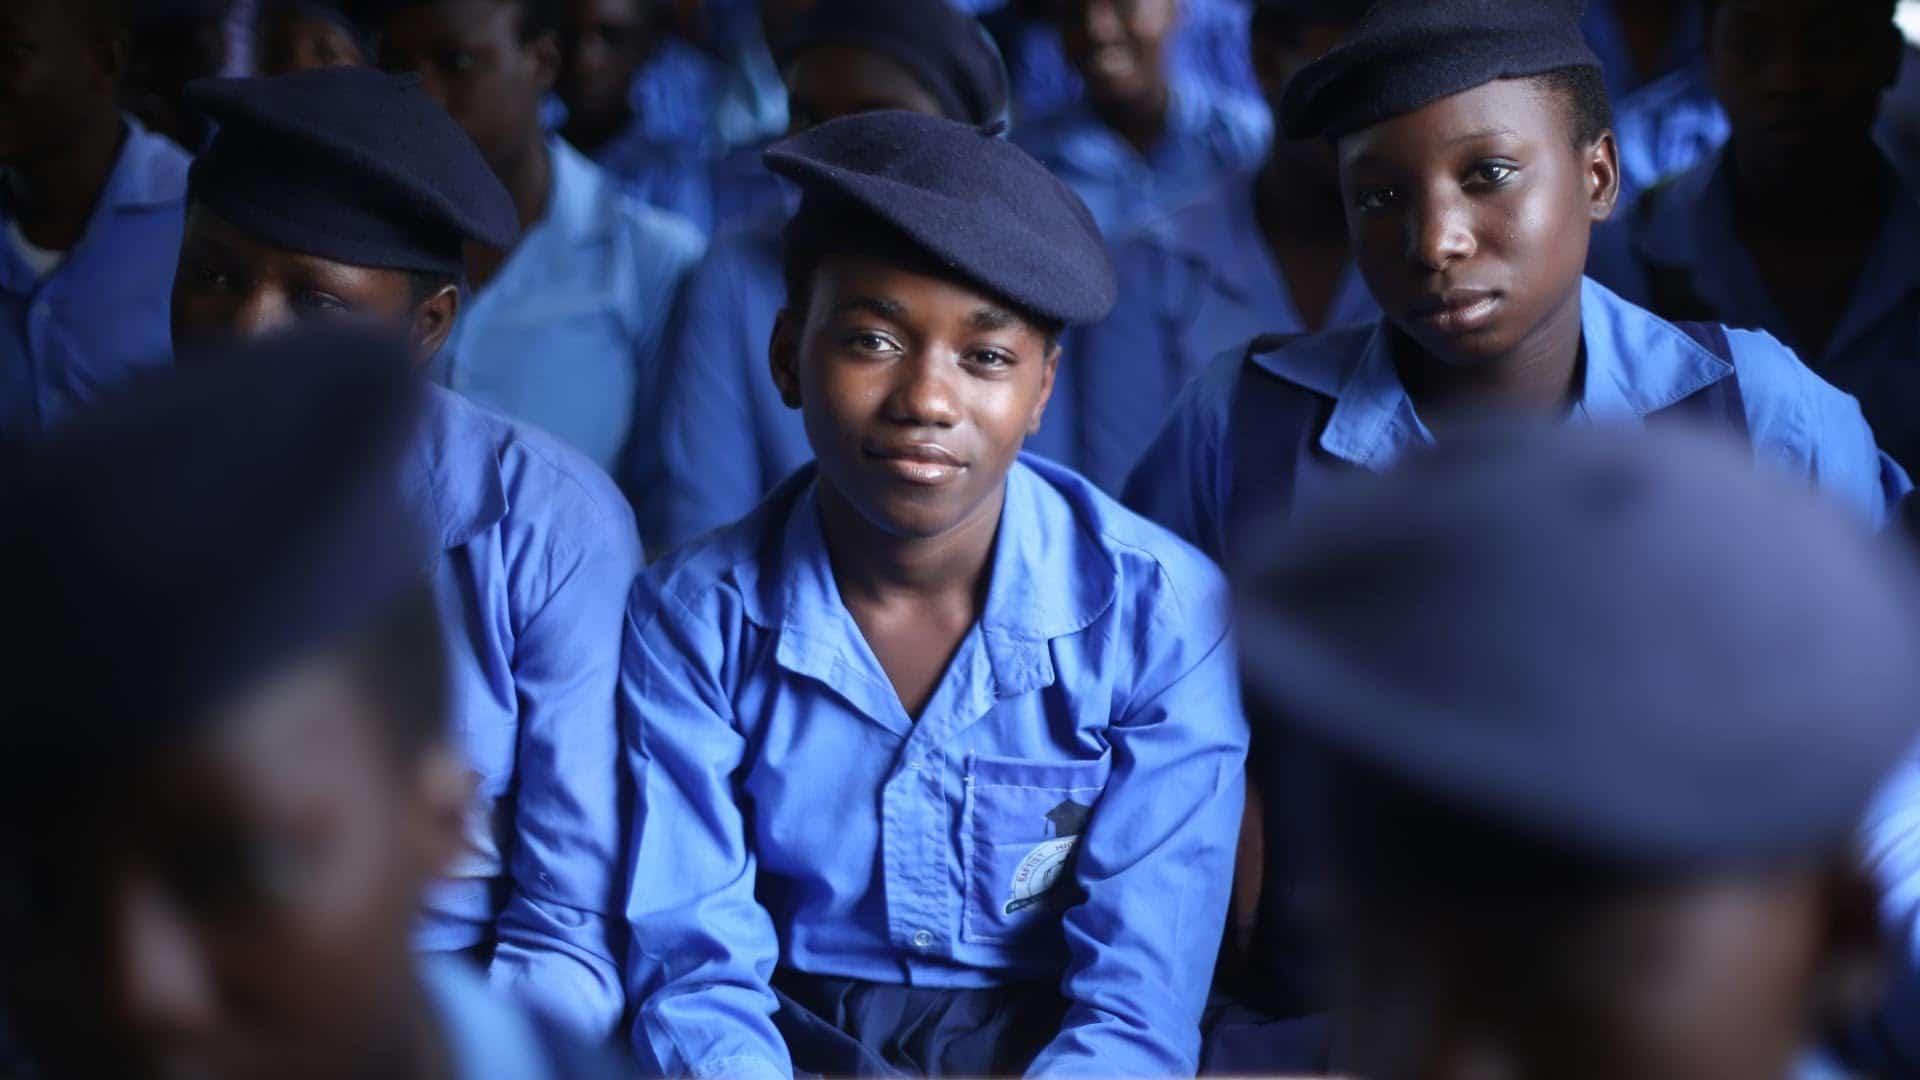 nigerian girls pissing in school videos